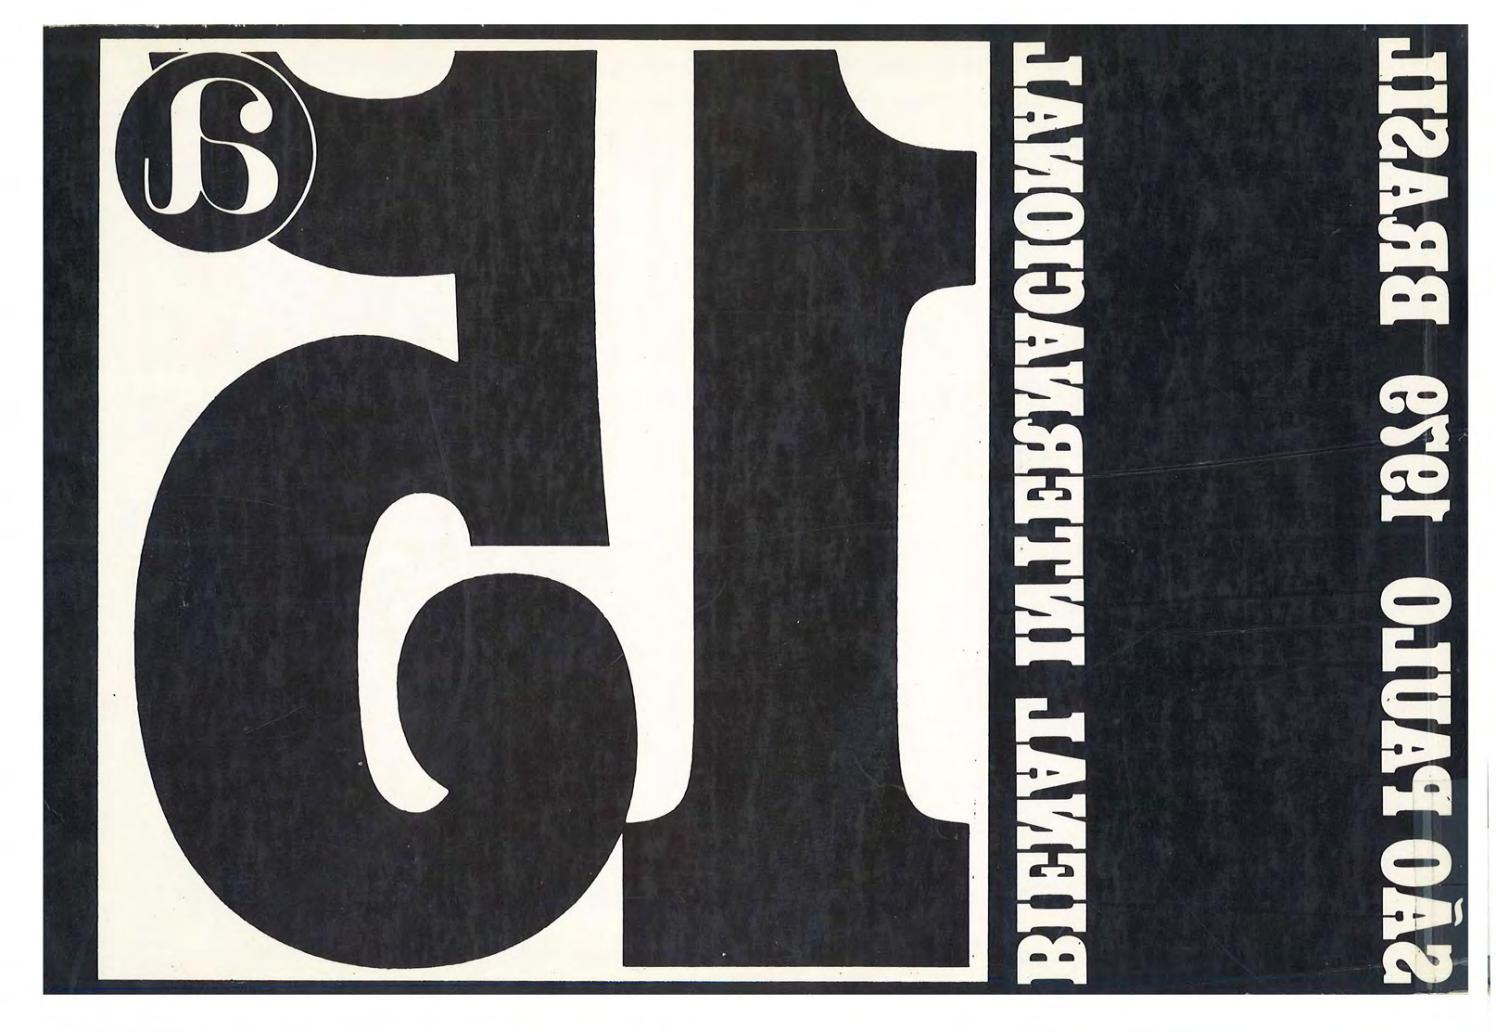 European Le Point Deau Flamant Rose Tapestries Intended For Current 15ª Bienal De São Paulo (1979) – Catálogobienal São (View 5 of 20)